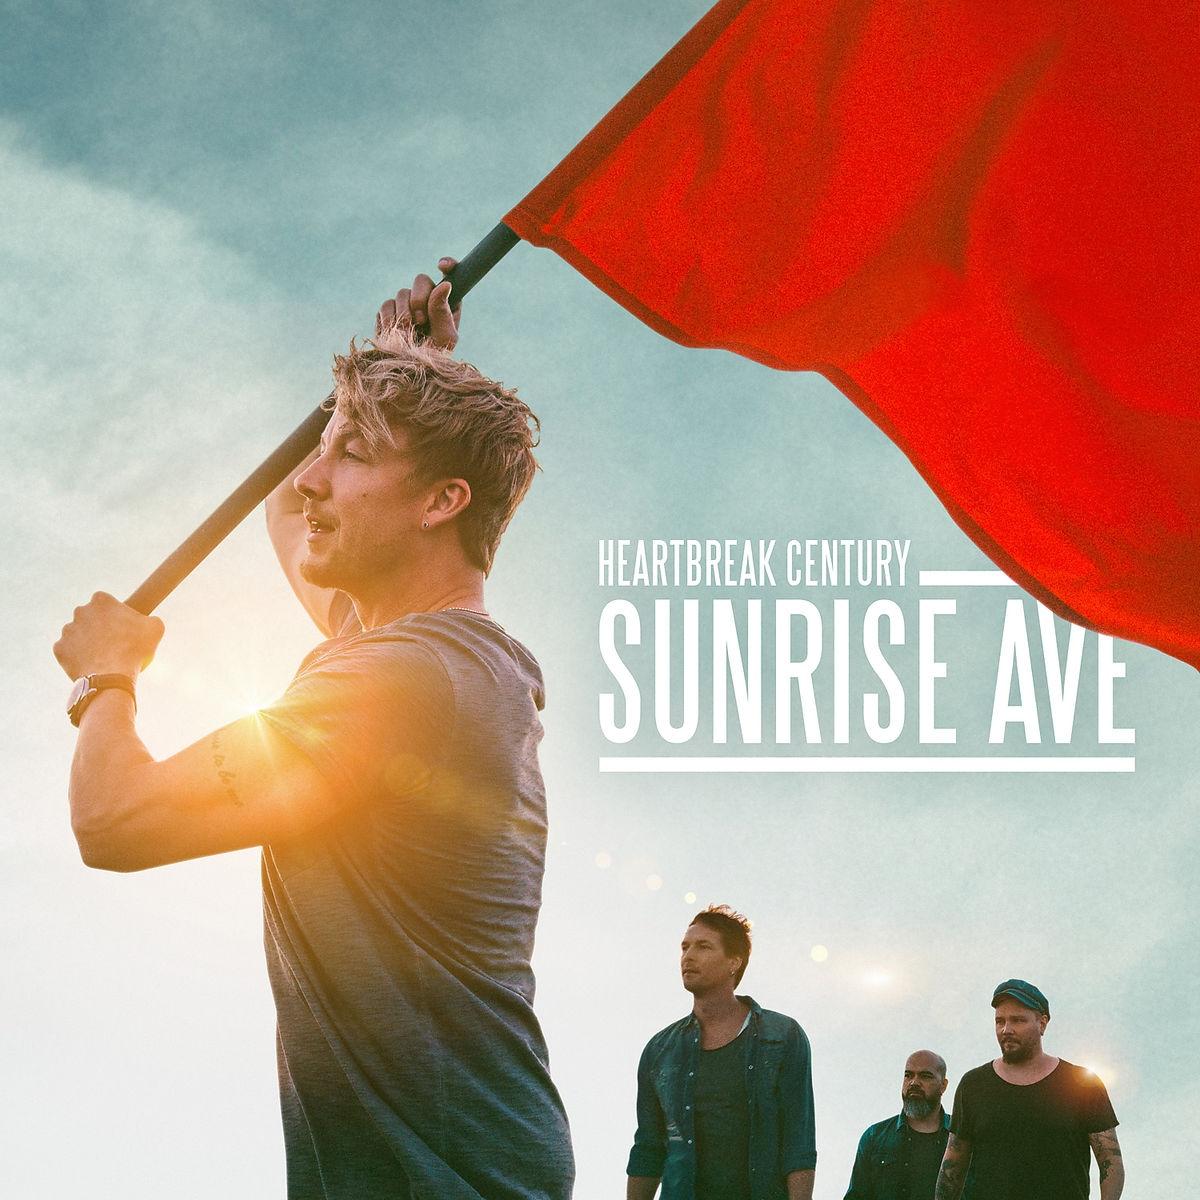 √HEARTBREAK CENTURY (LTD. DELUXE EDT.) von Sunrise Avenue - CD jetzt im Sunrise Avenue Shop